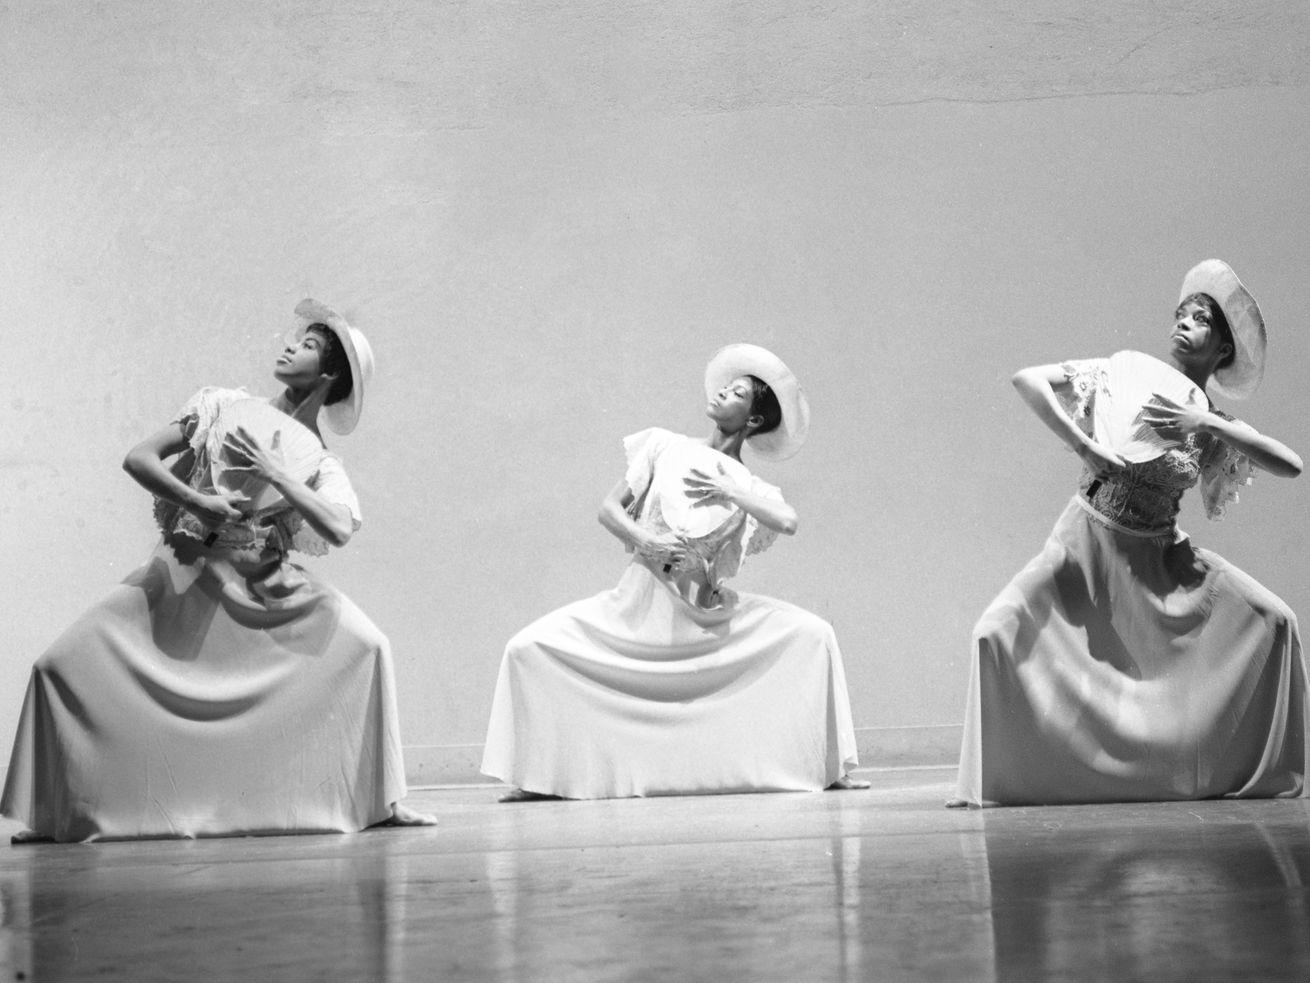 Twin documentaries spotlight dance legends Alvin Ailey and Bill T. Jones